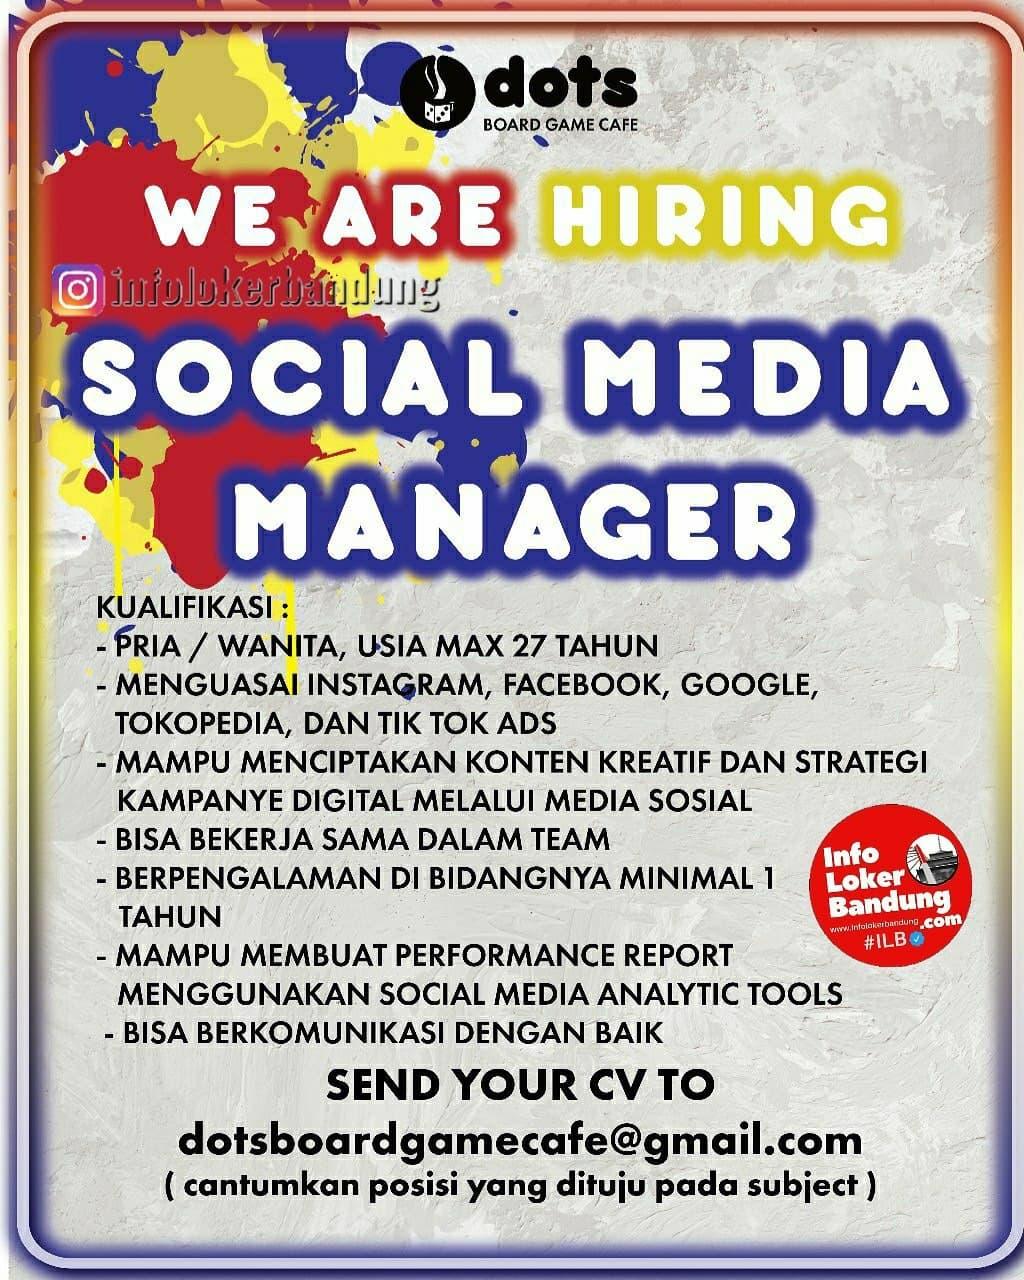 Lowongan Kerja Social Media Manager Dots Board Gama Cafe Bandung Desember 2020